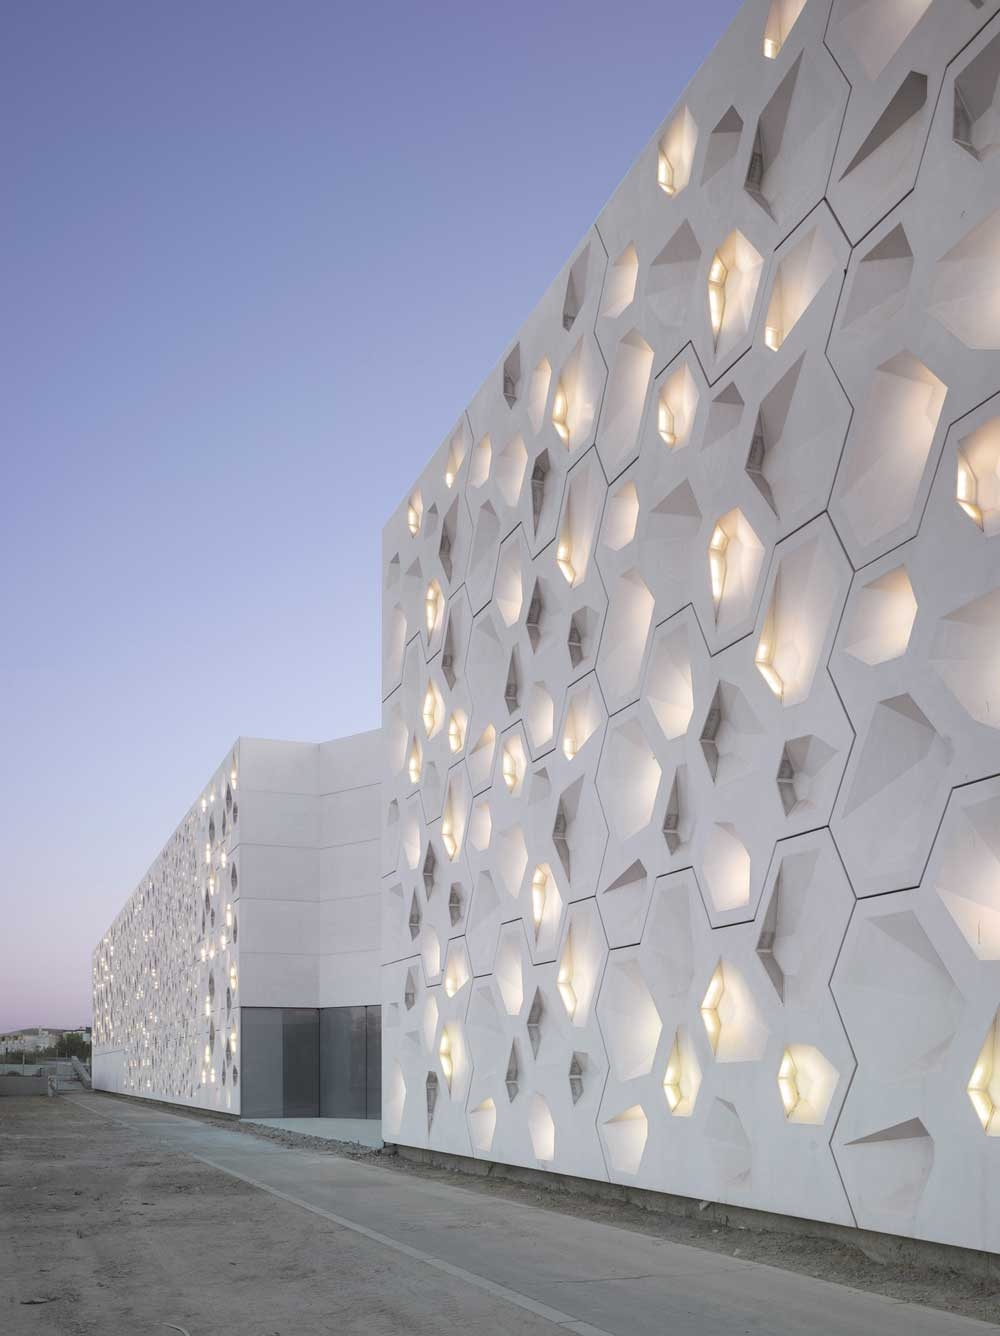 centro de arte contemporaneo cordoba 1000x1336 c